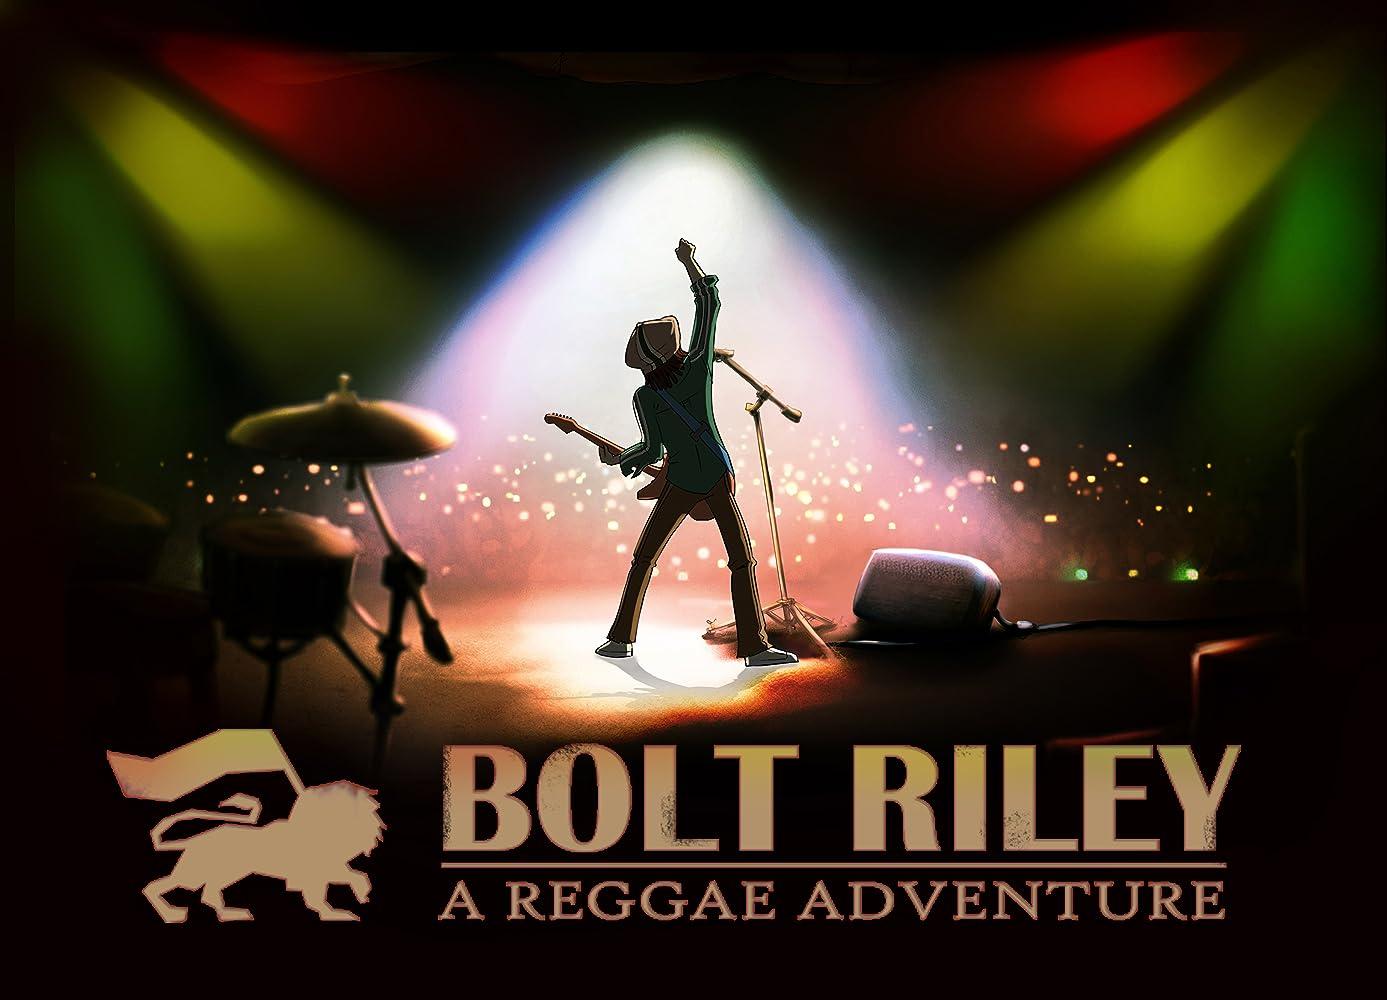 Bolt Riley - A Reggae Adventure (2016)